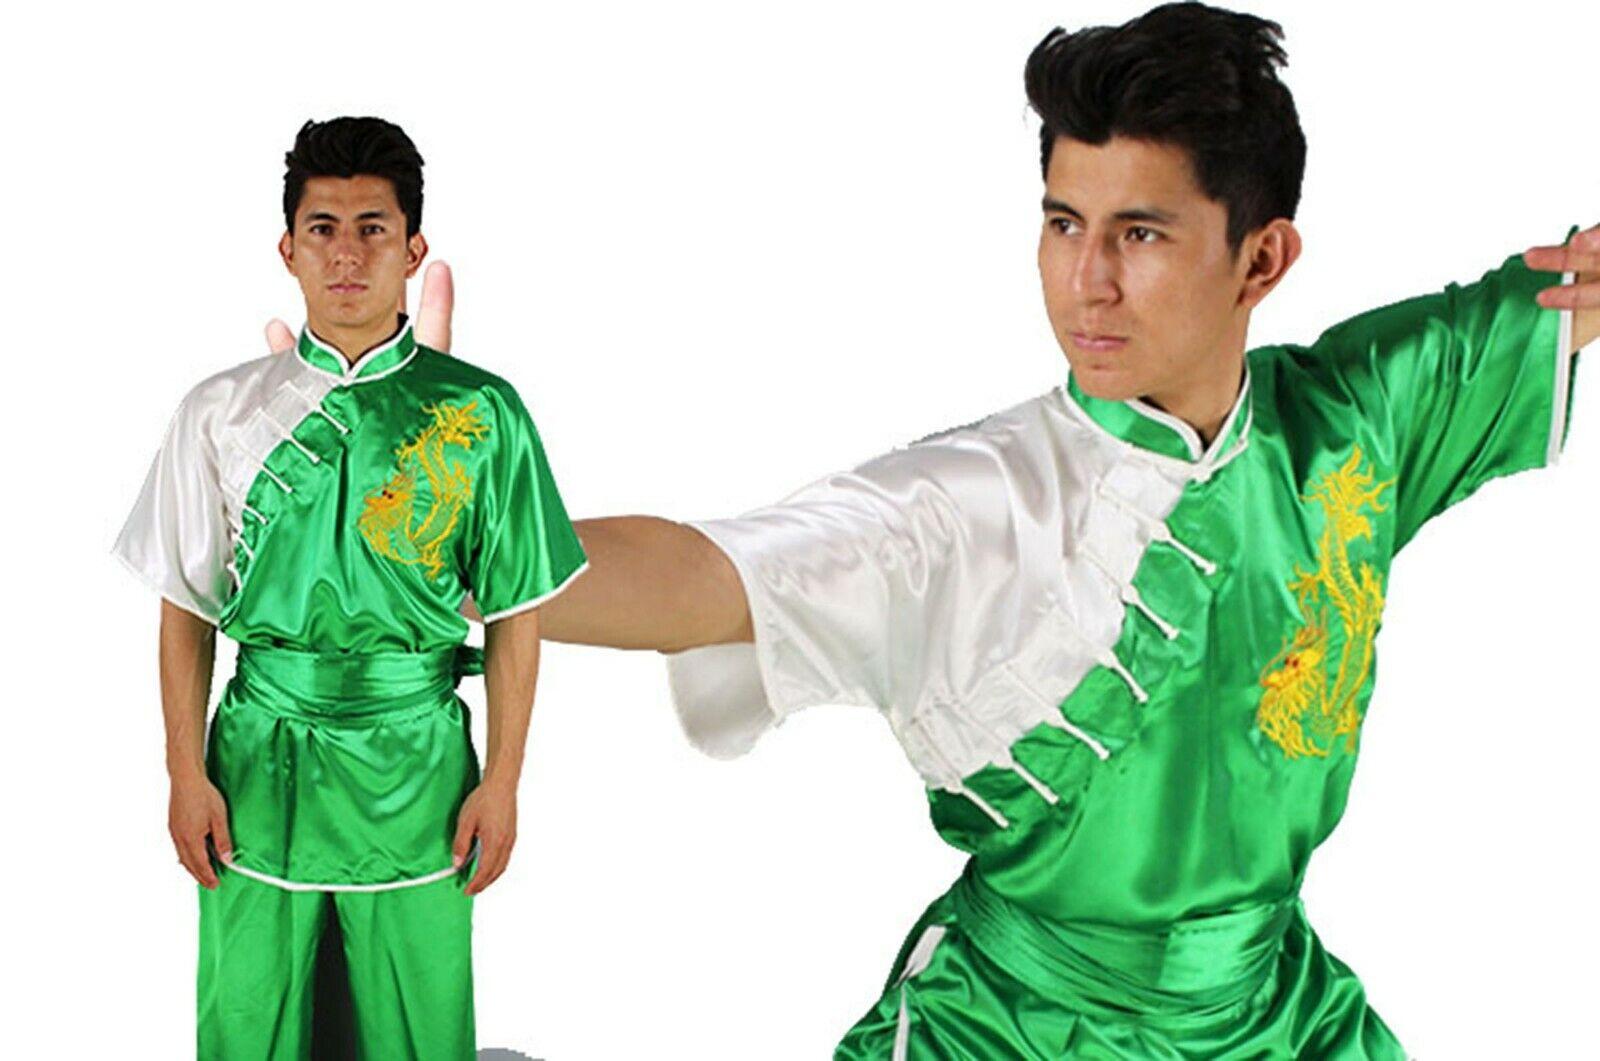 Uniforme Uniforme Uniforme Kimono KUNG FU Divisa Chang Quan Uniform Shan XI drago Grün East Grün a24eea